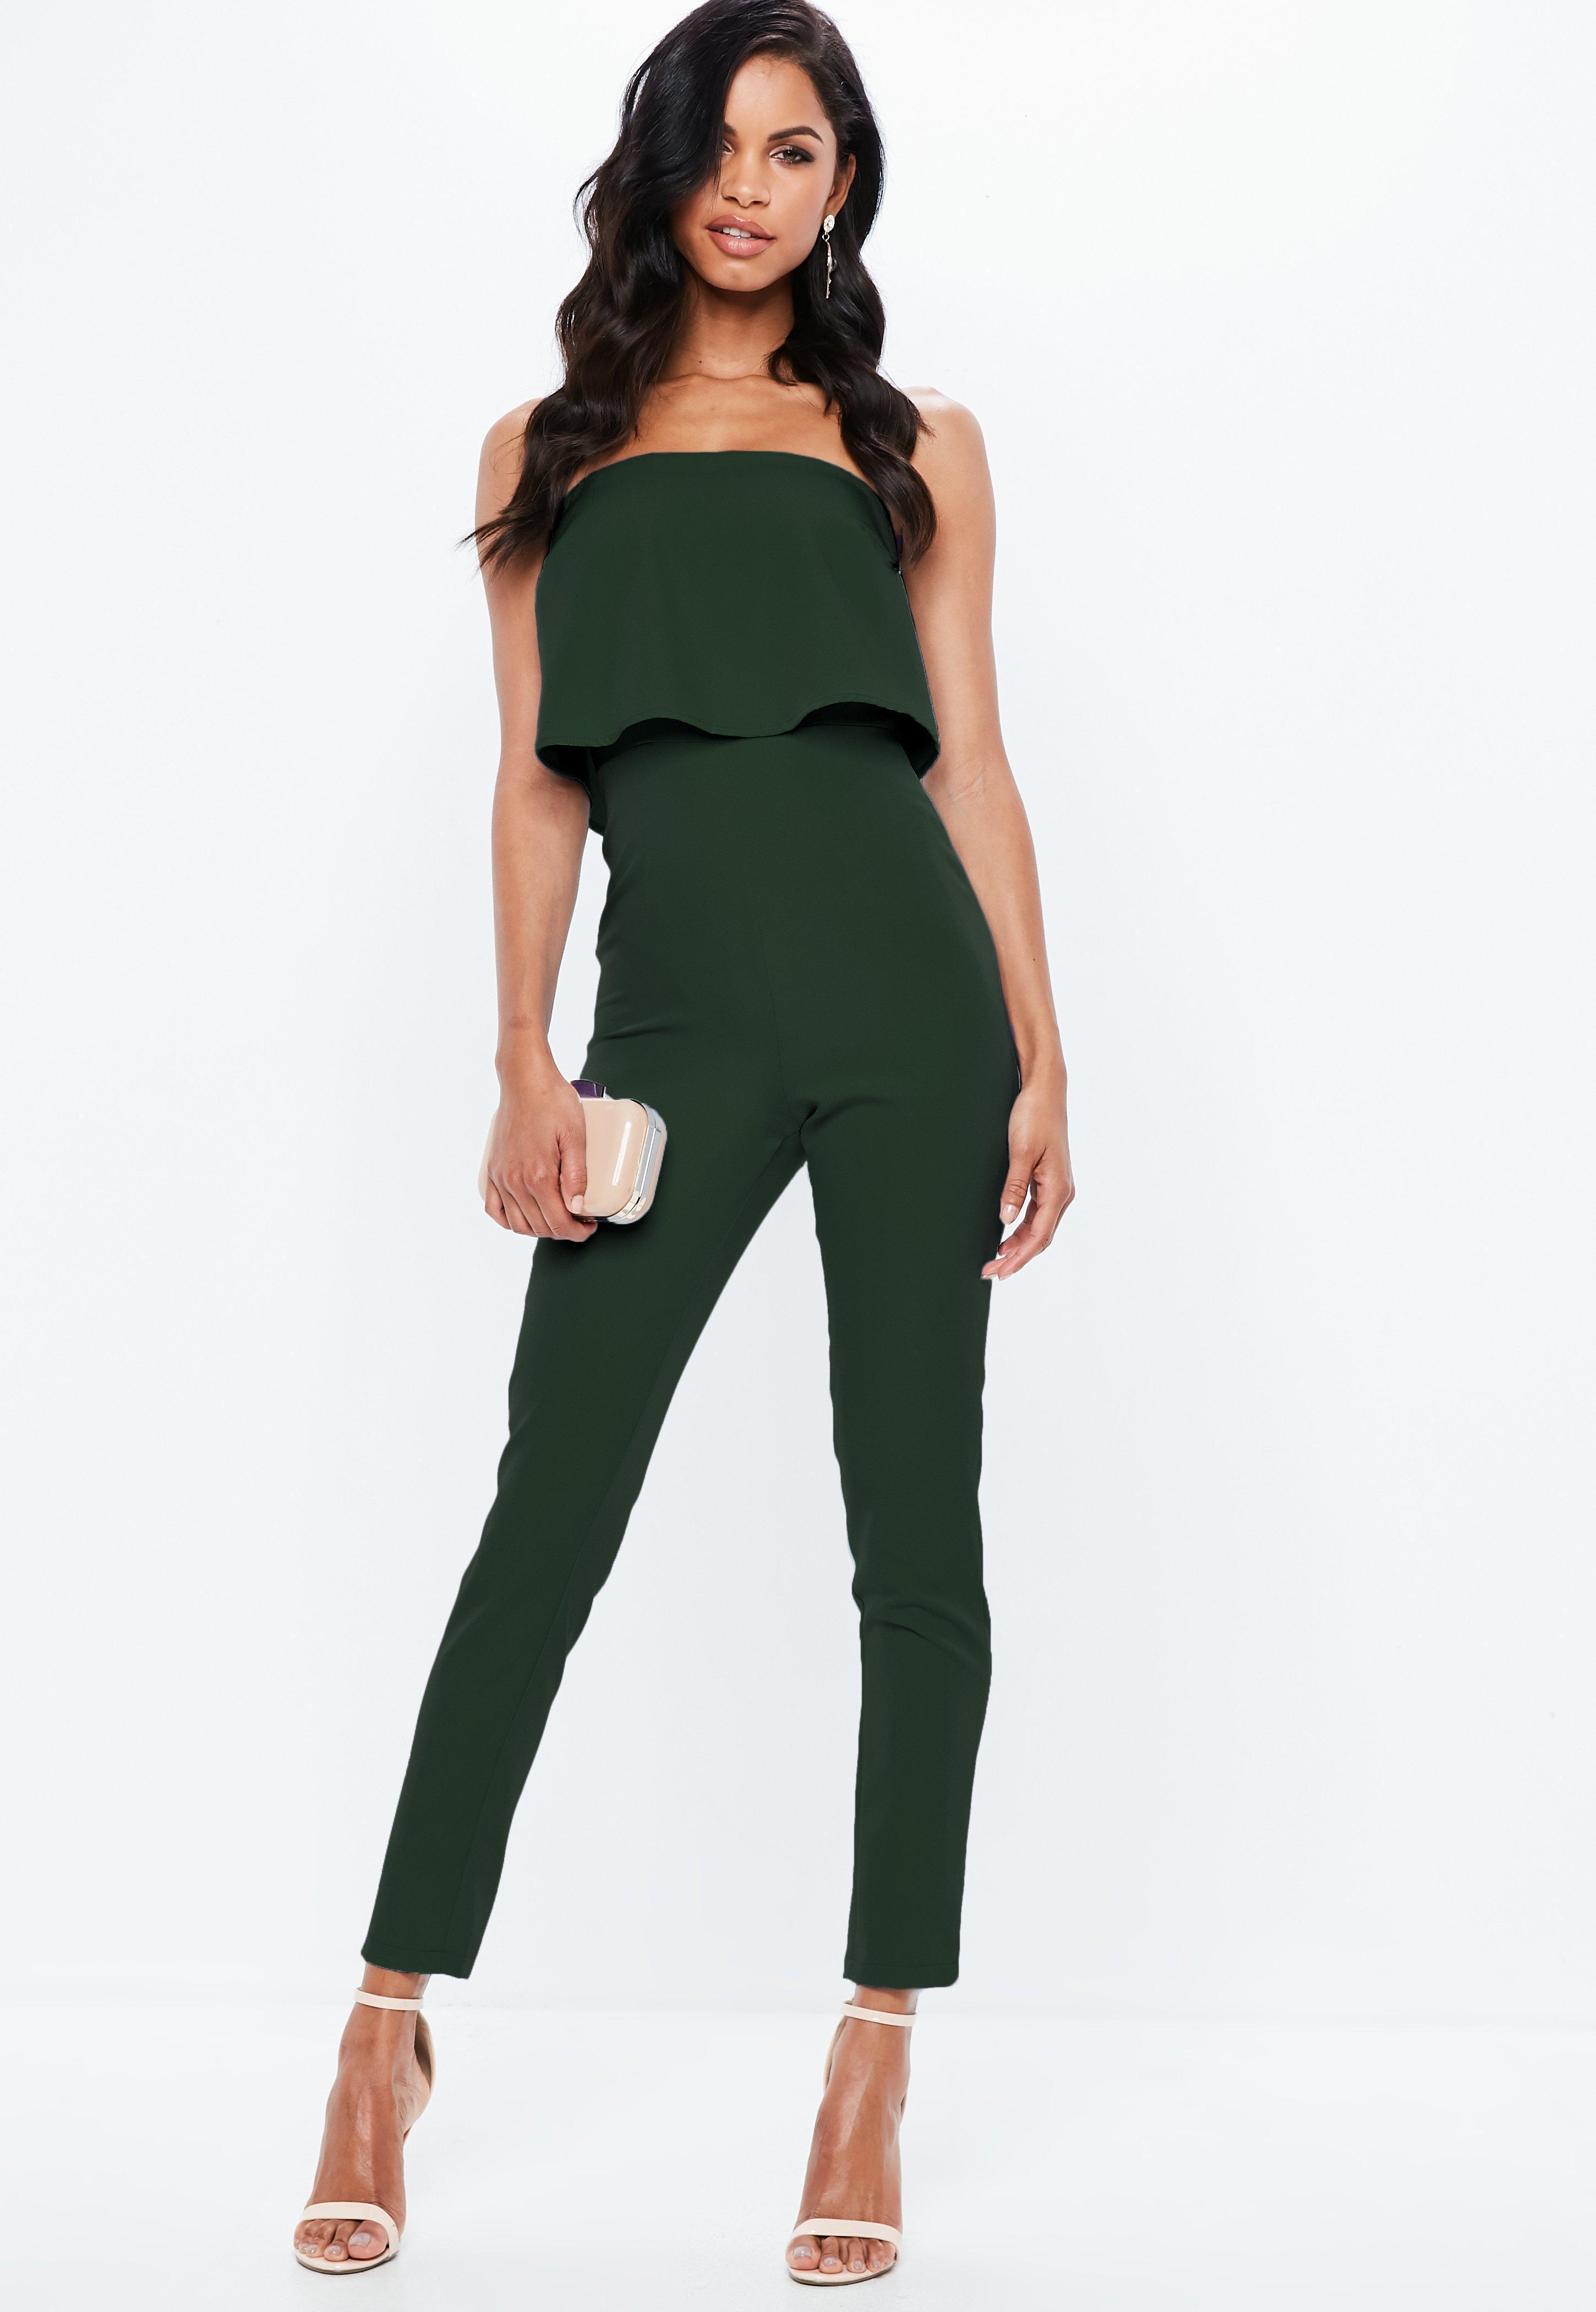 79d0e0434826 Gallery. Women s Ruffle Jumpsuits Women s One Shoulder Green ...